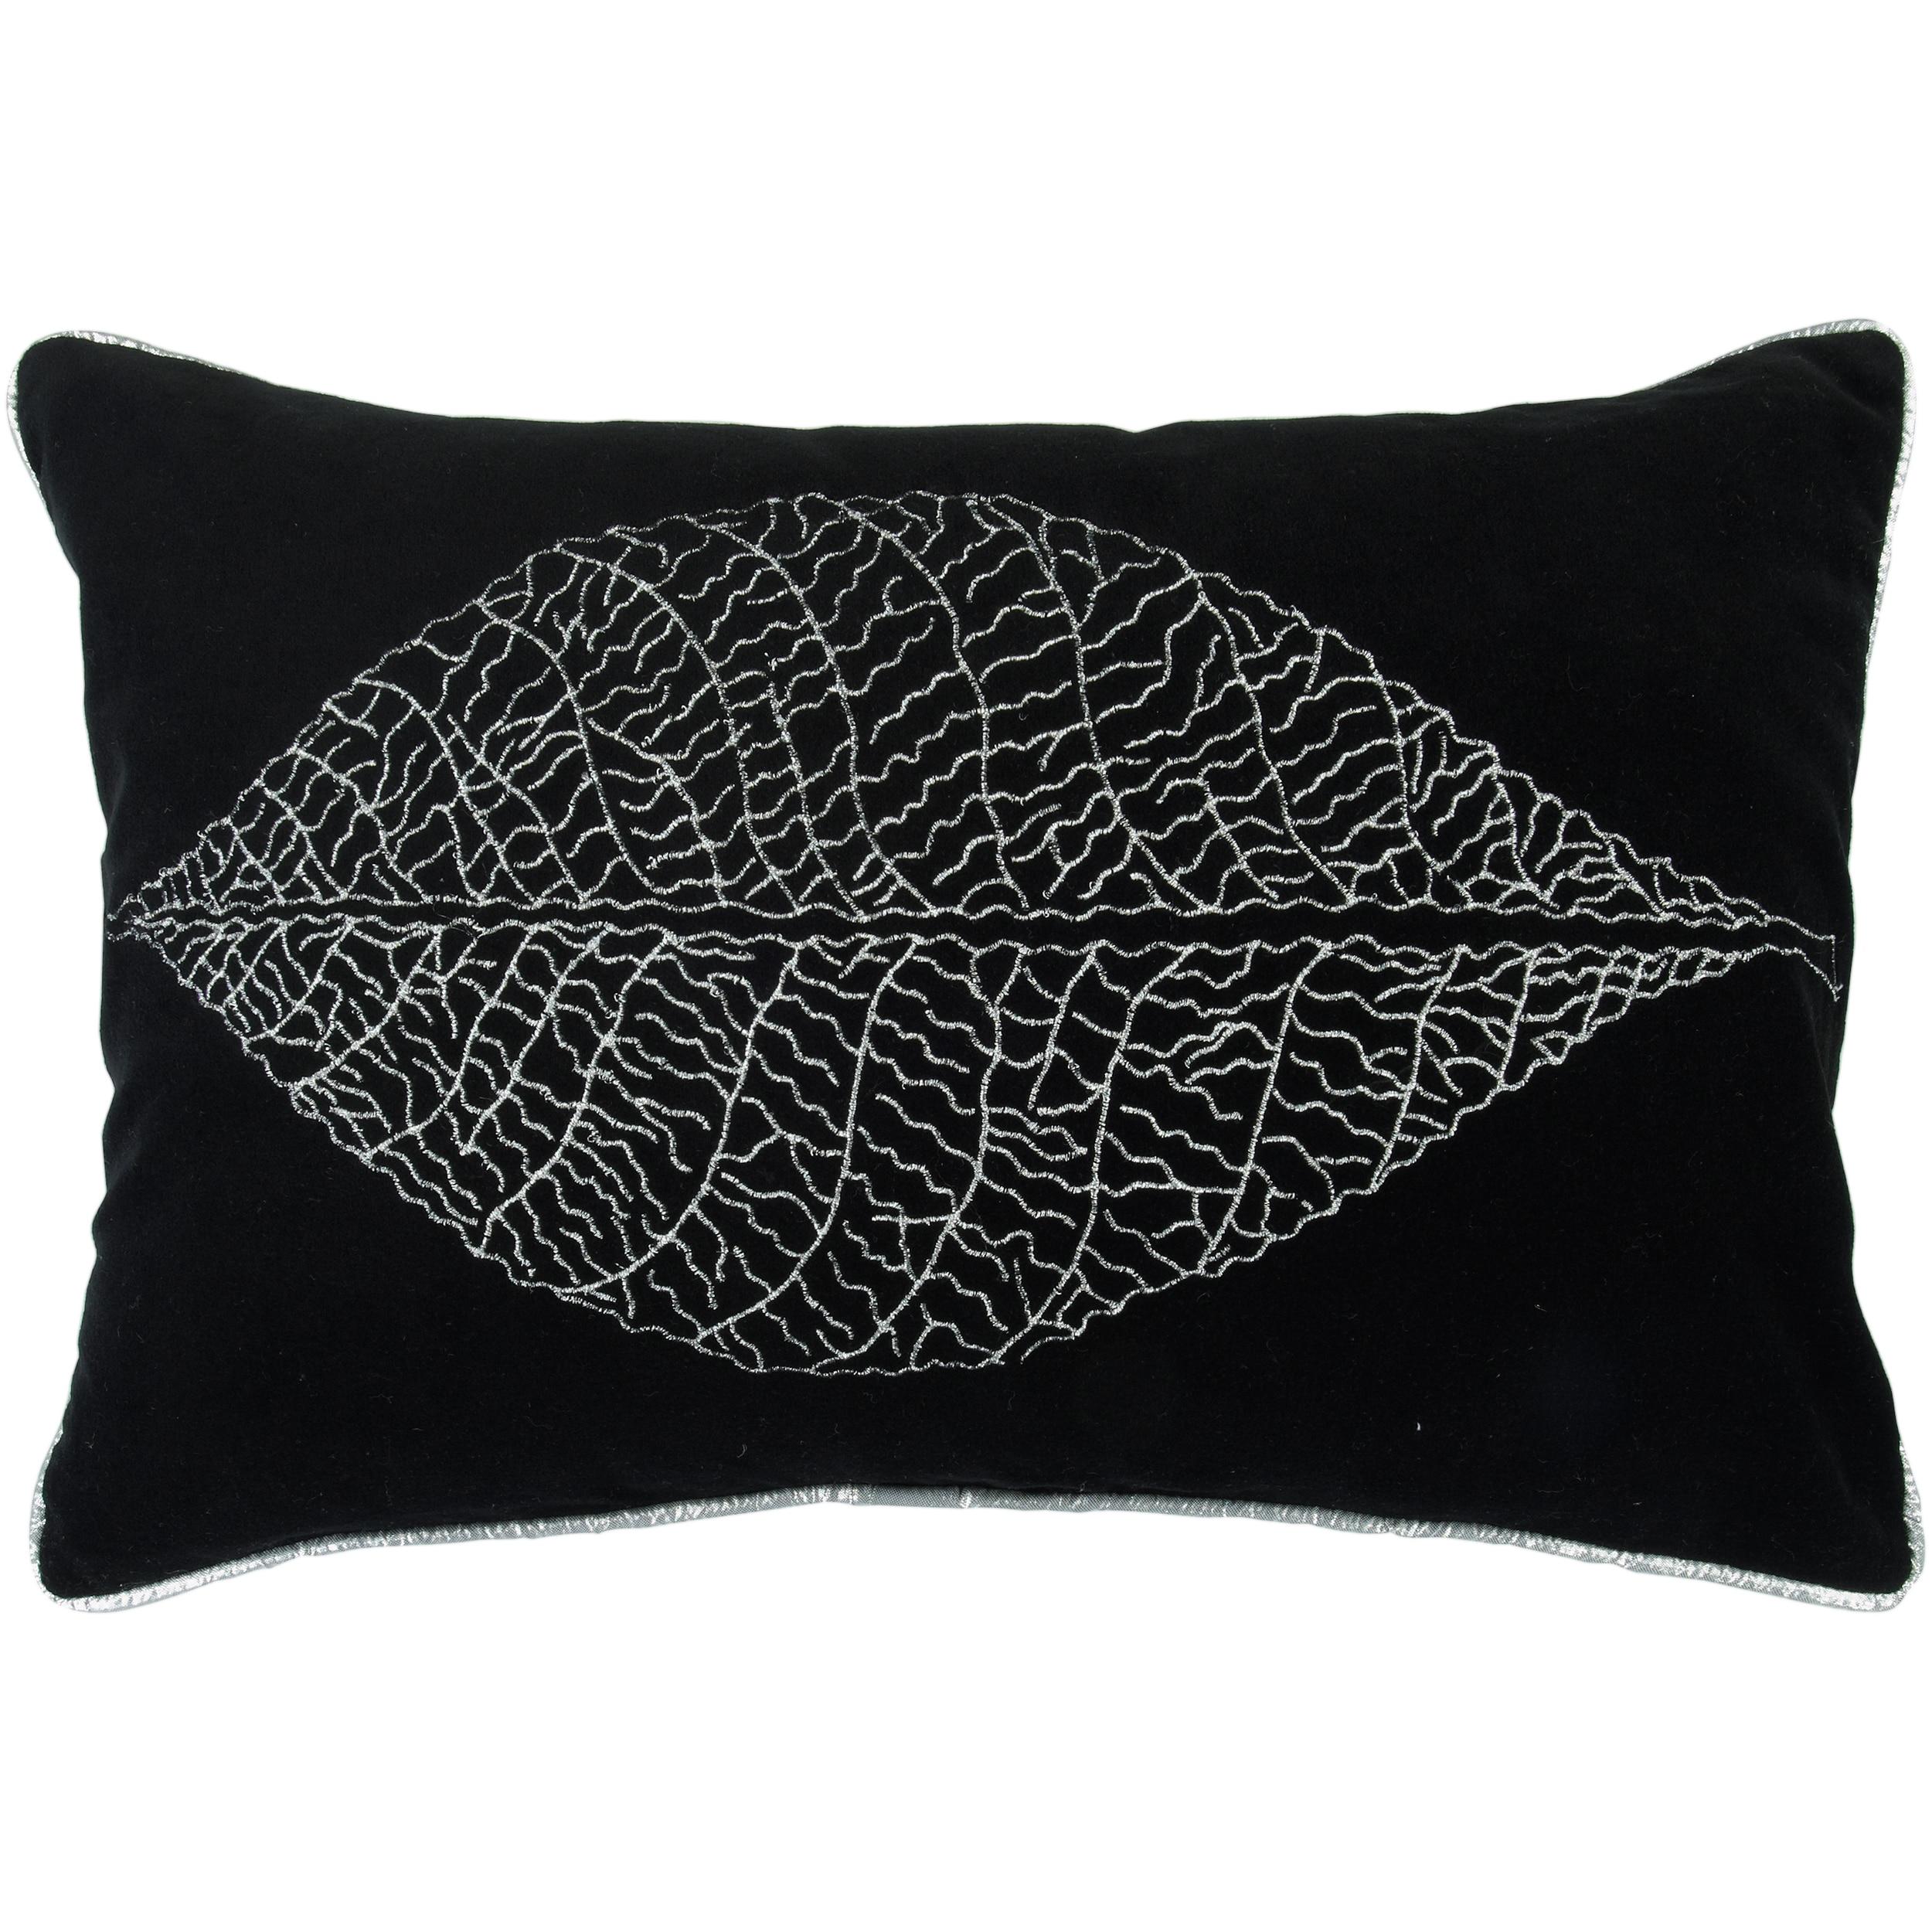 Decorative Mink 13-inch x 20-inch Down Pillow